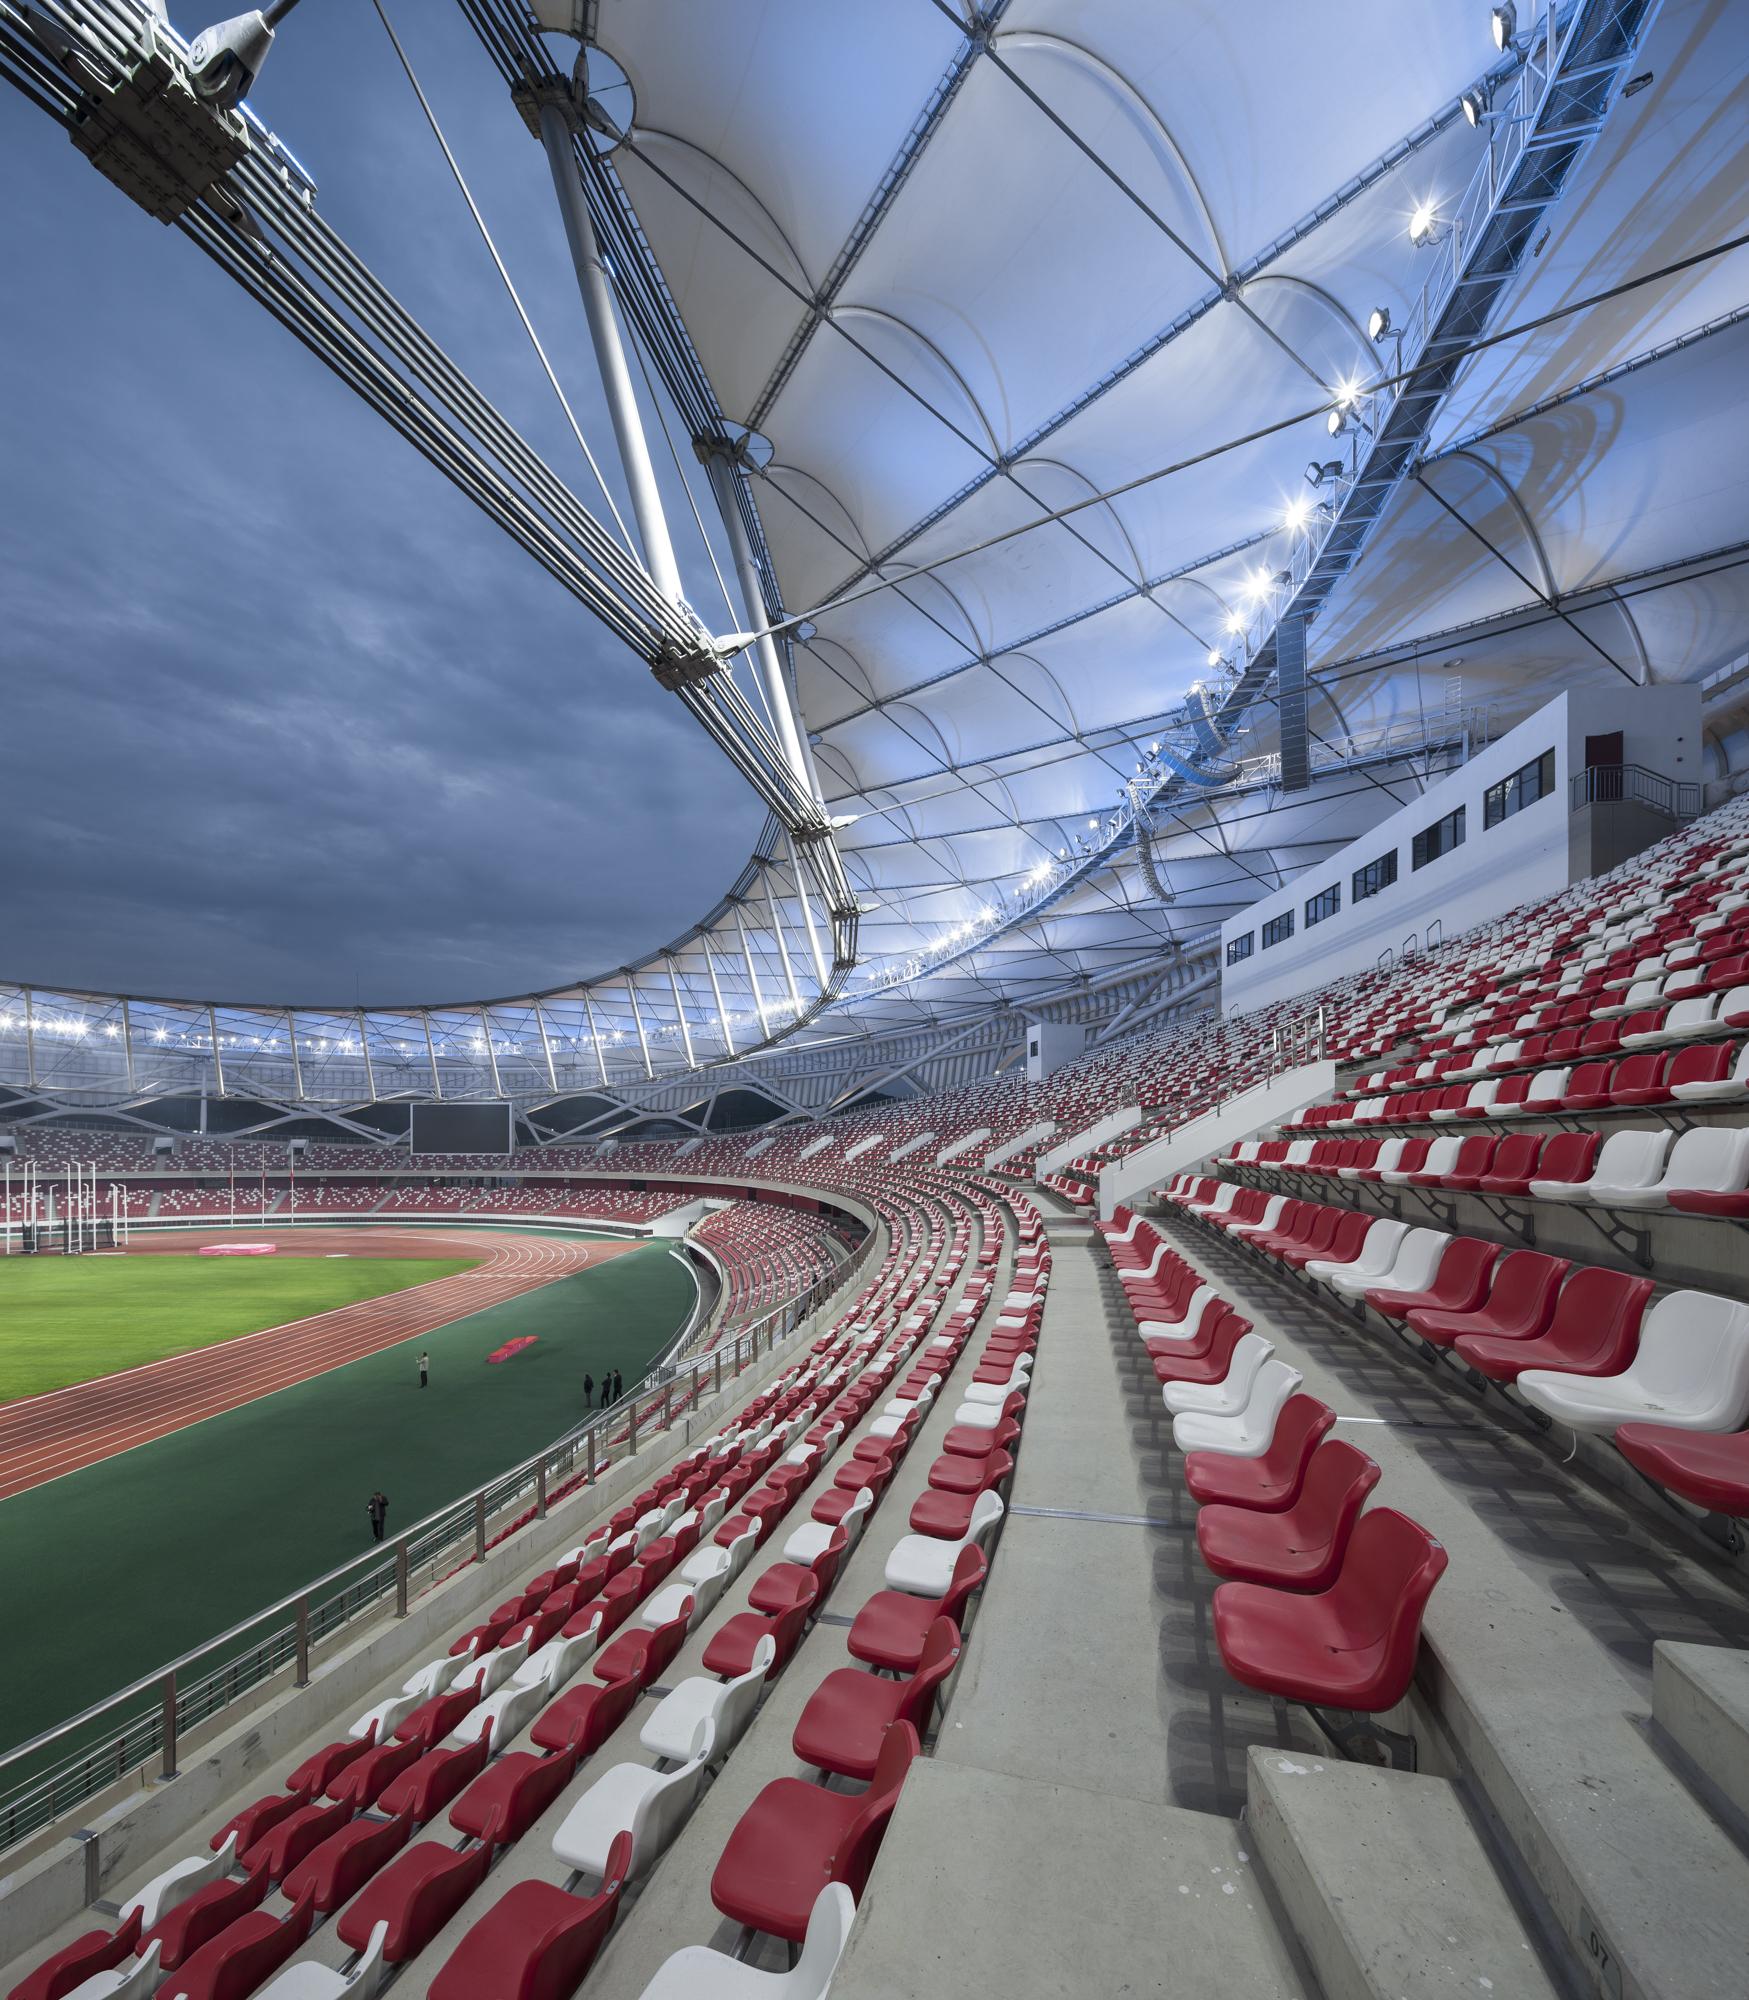 Stades cultes Stade Zaozhuang par Shanghai United Design Group, Shandong, Chine